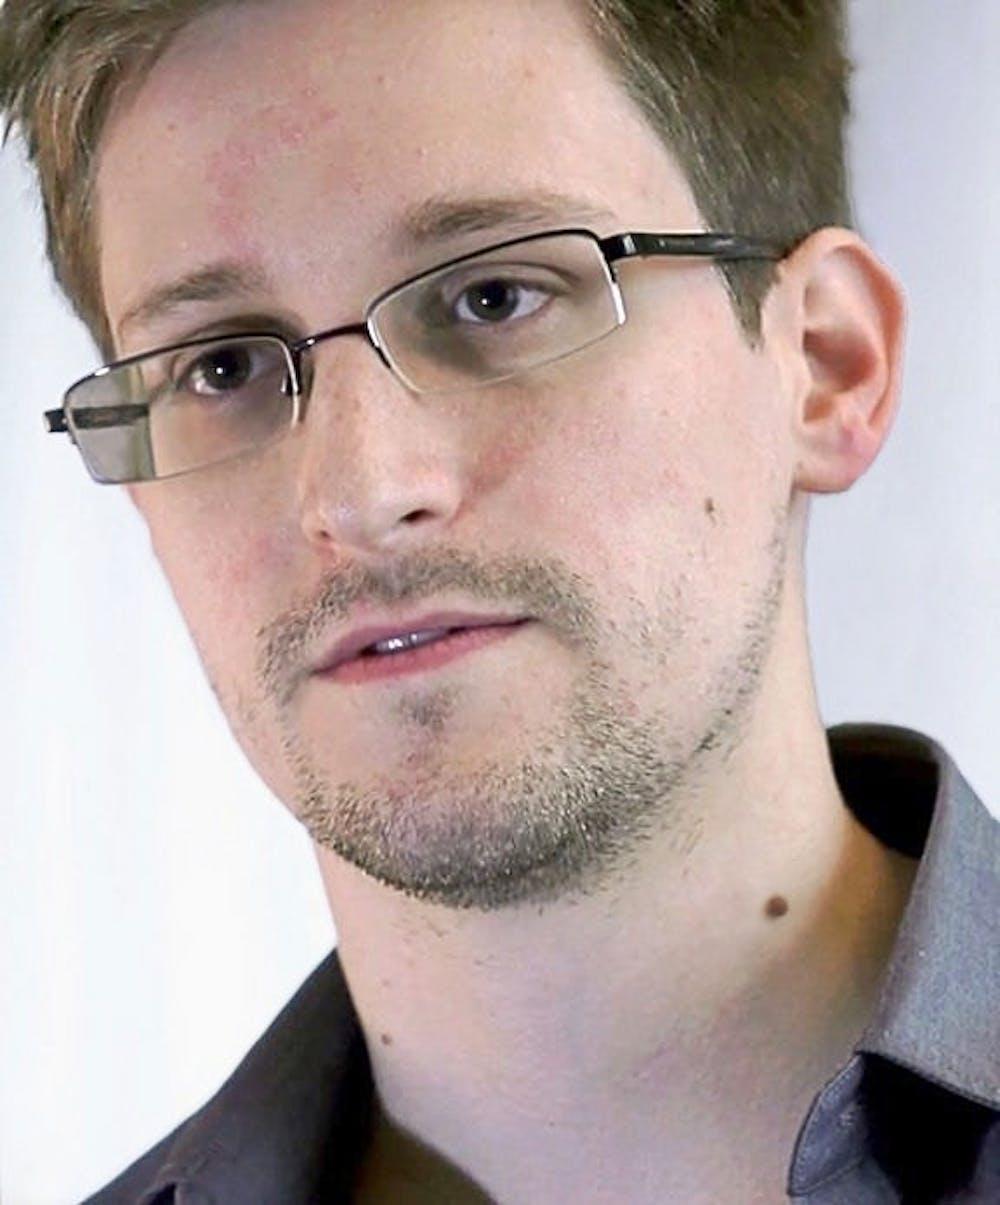 Edward Snowden is a traitor